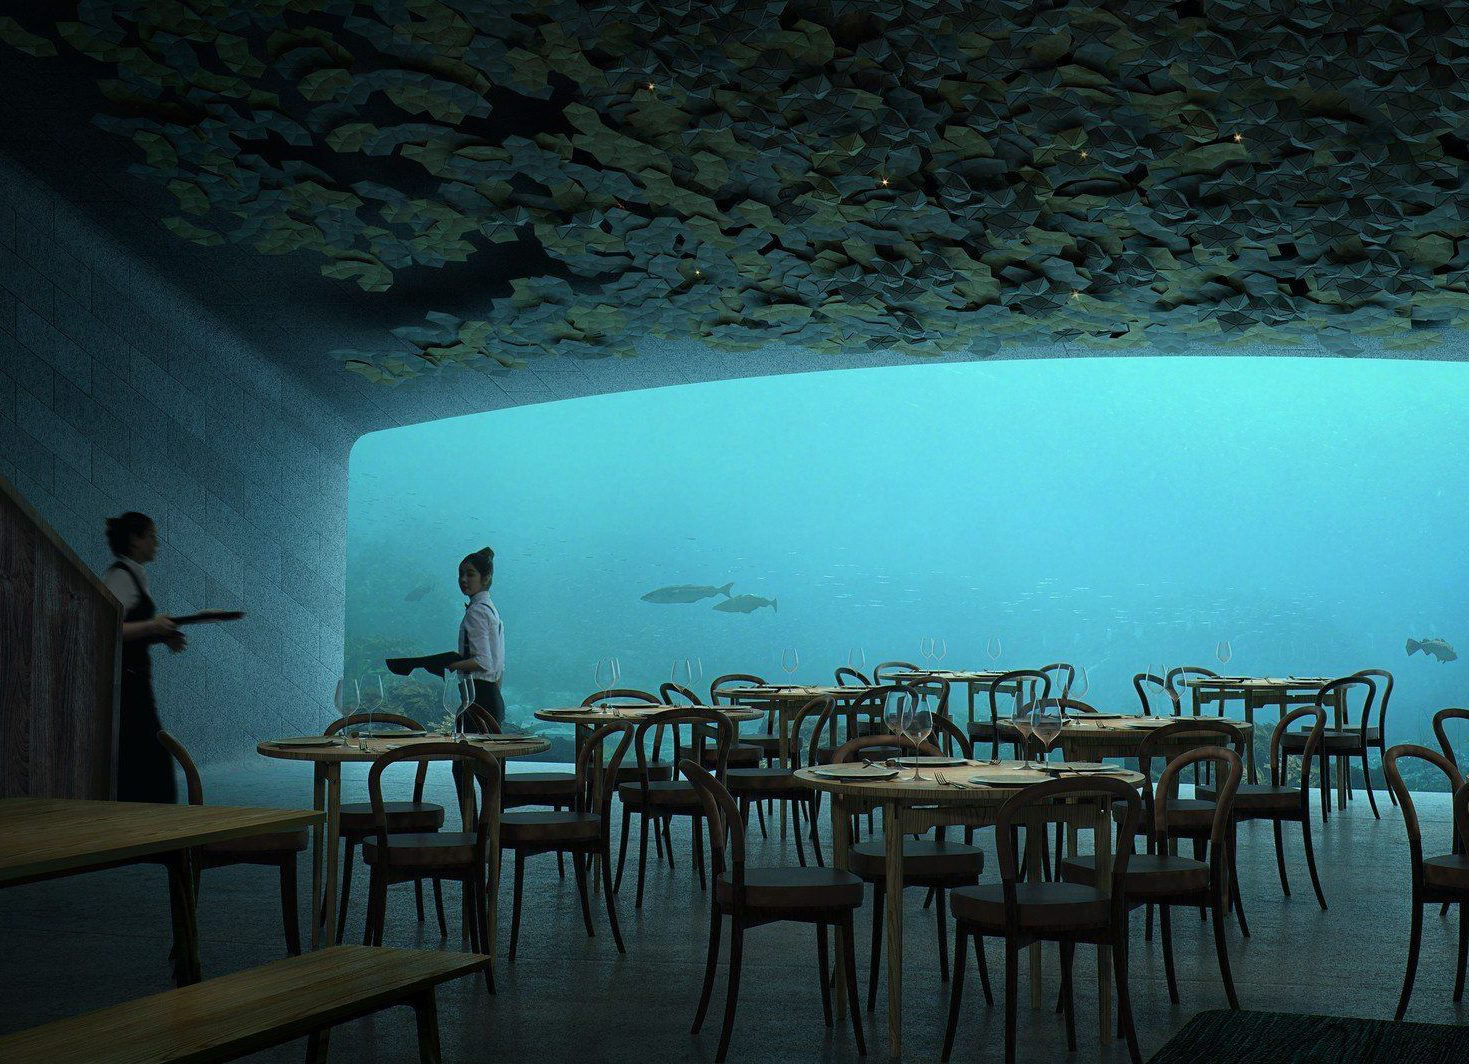 An underwater restaurant is opening on Norway's coastline